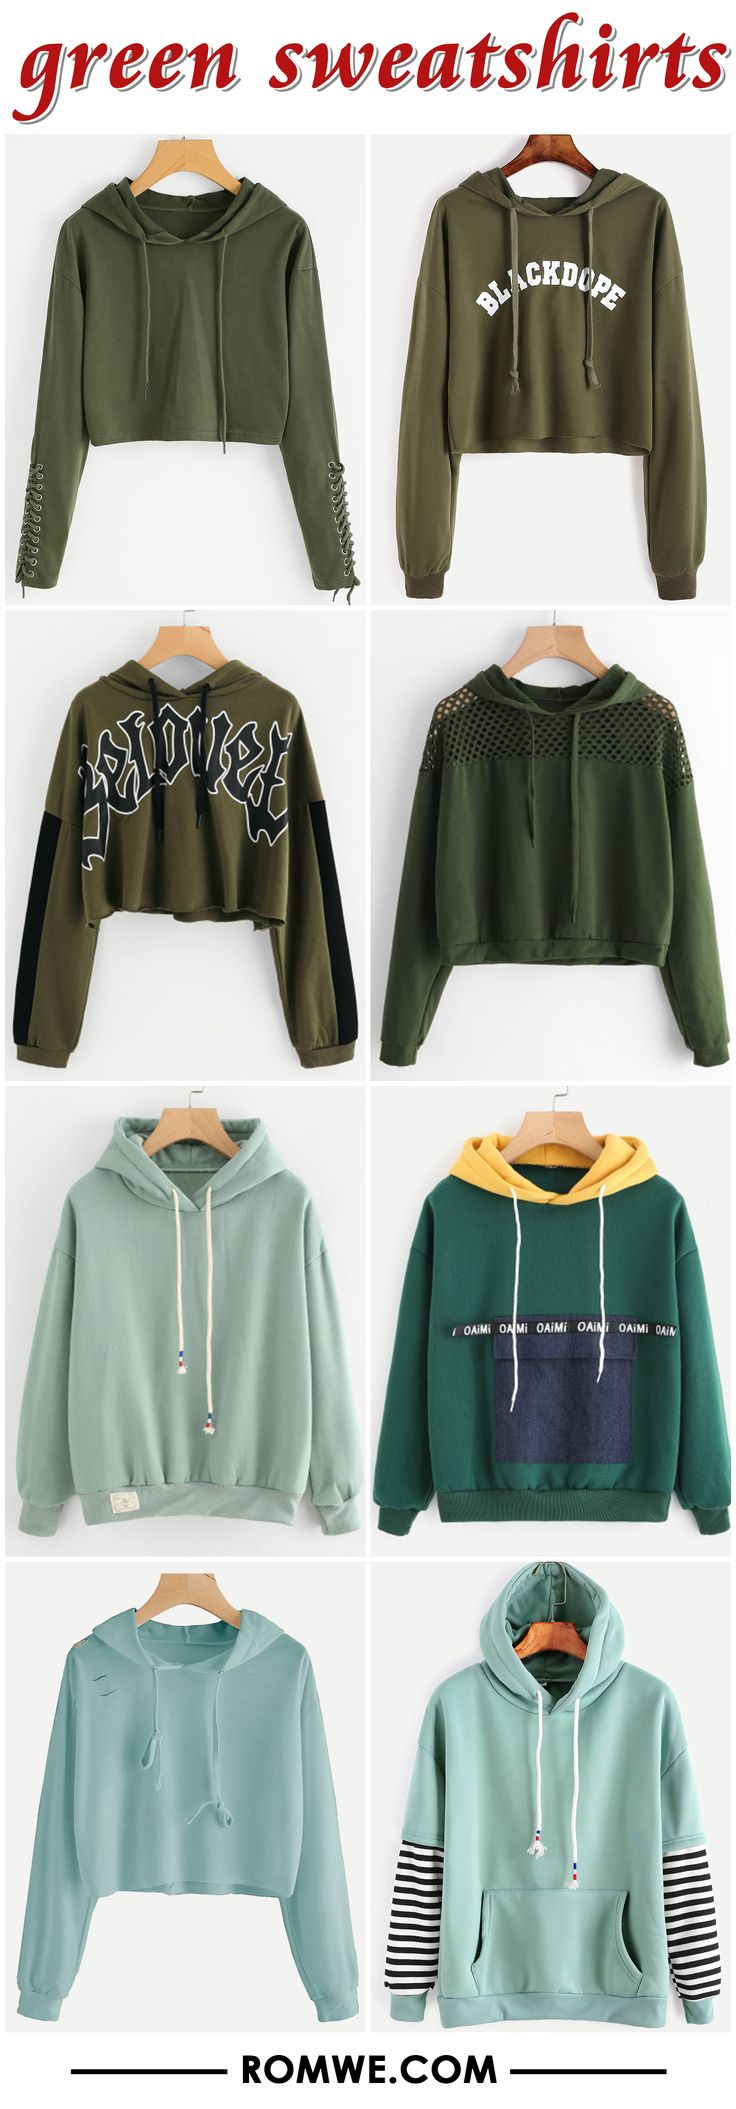 green sweatshirts 2017 - romwe.com